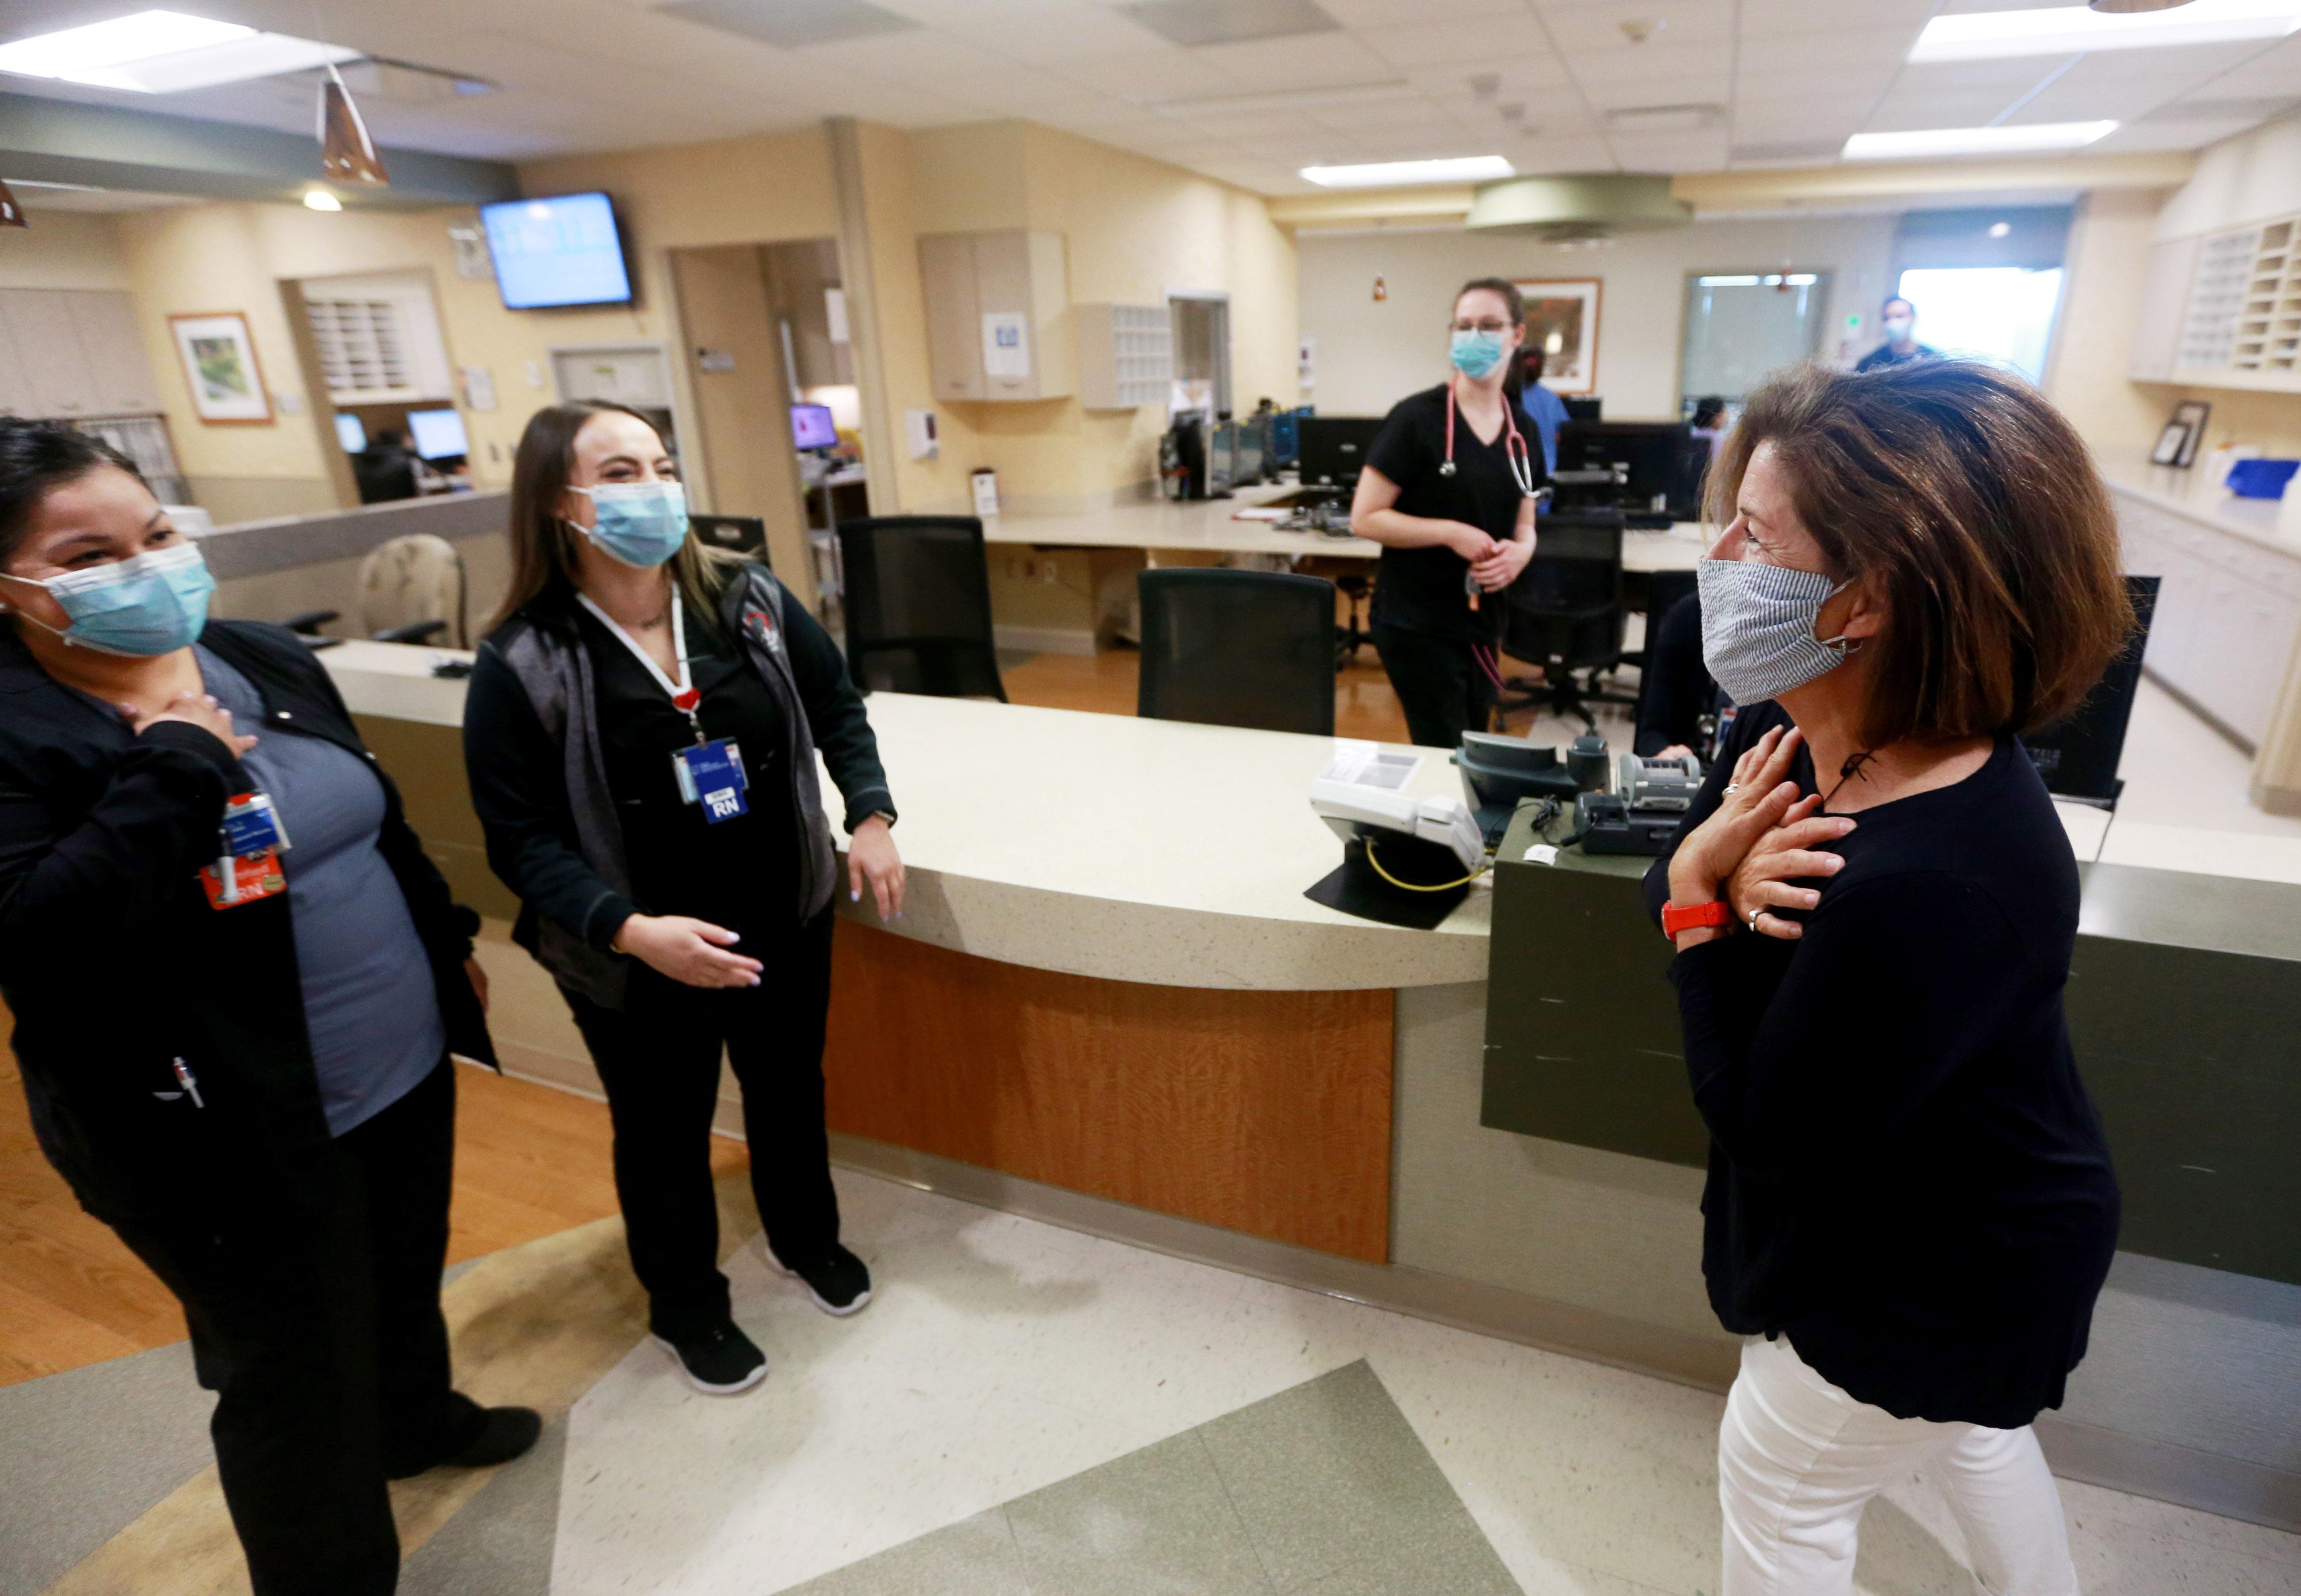 Covid 19 Patient Returns To Thank Hospital Staff Nj Com